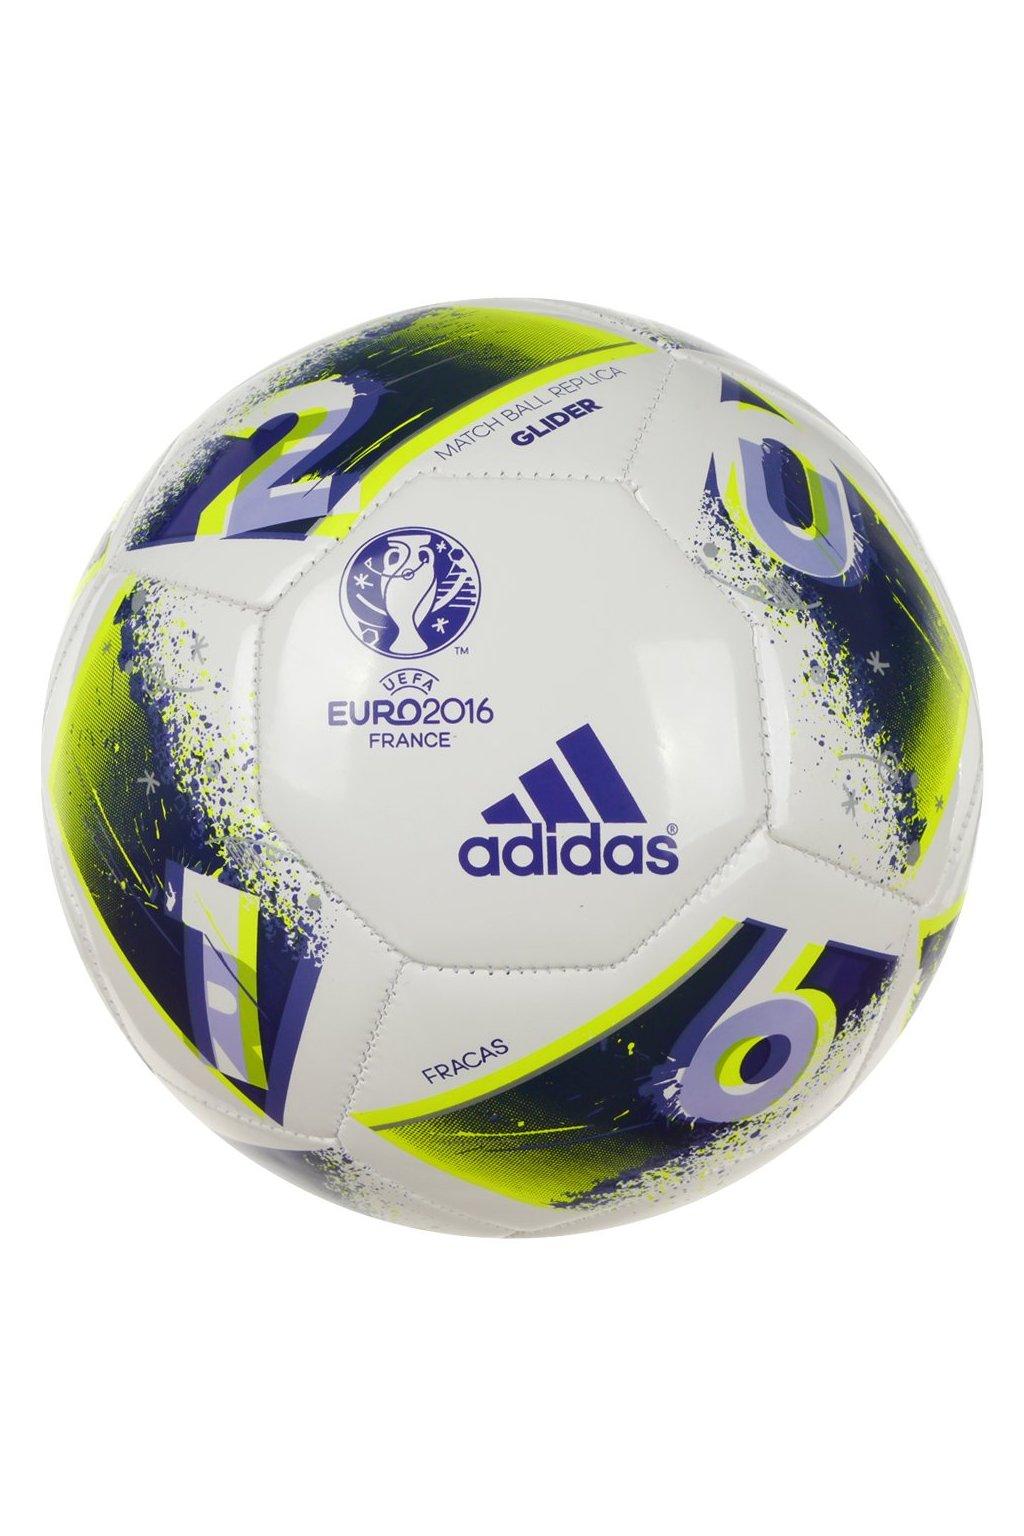 9623bd027a74c pol pl Pilka nozna Adidas UEFA Euro 2016 Fracas Match Ball na orlik 11692 1